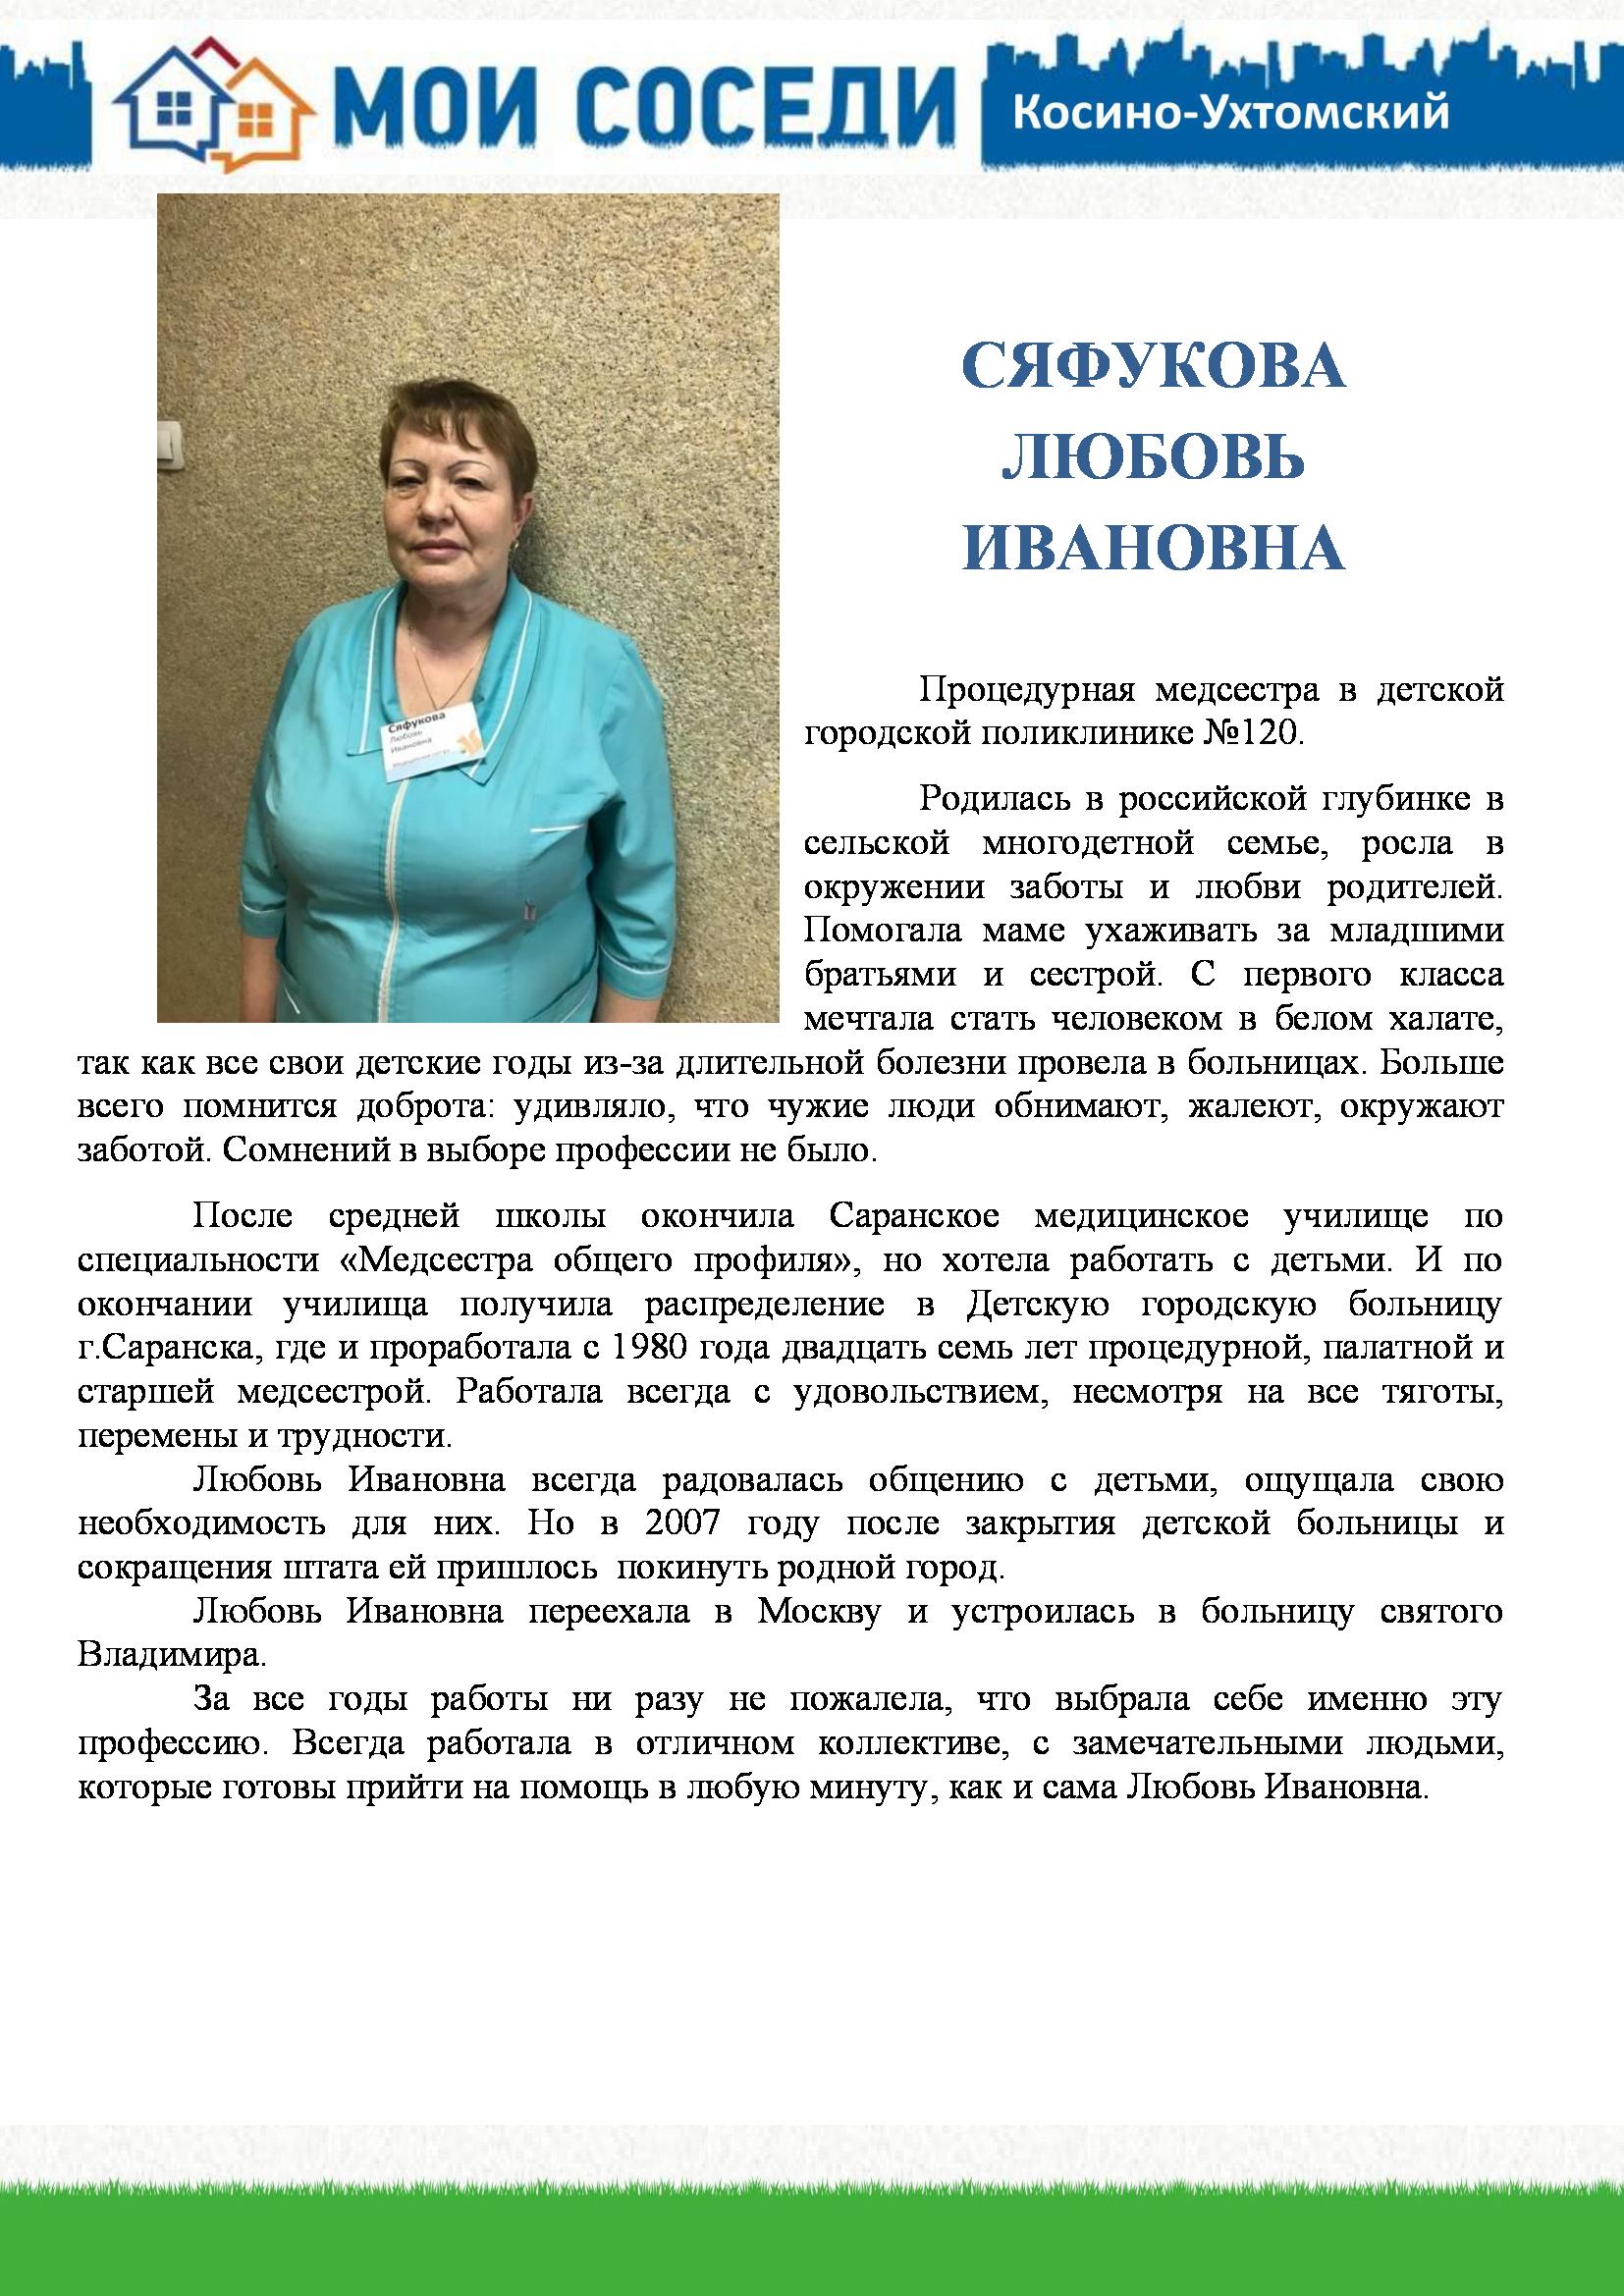 Сяфукова